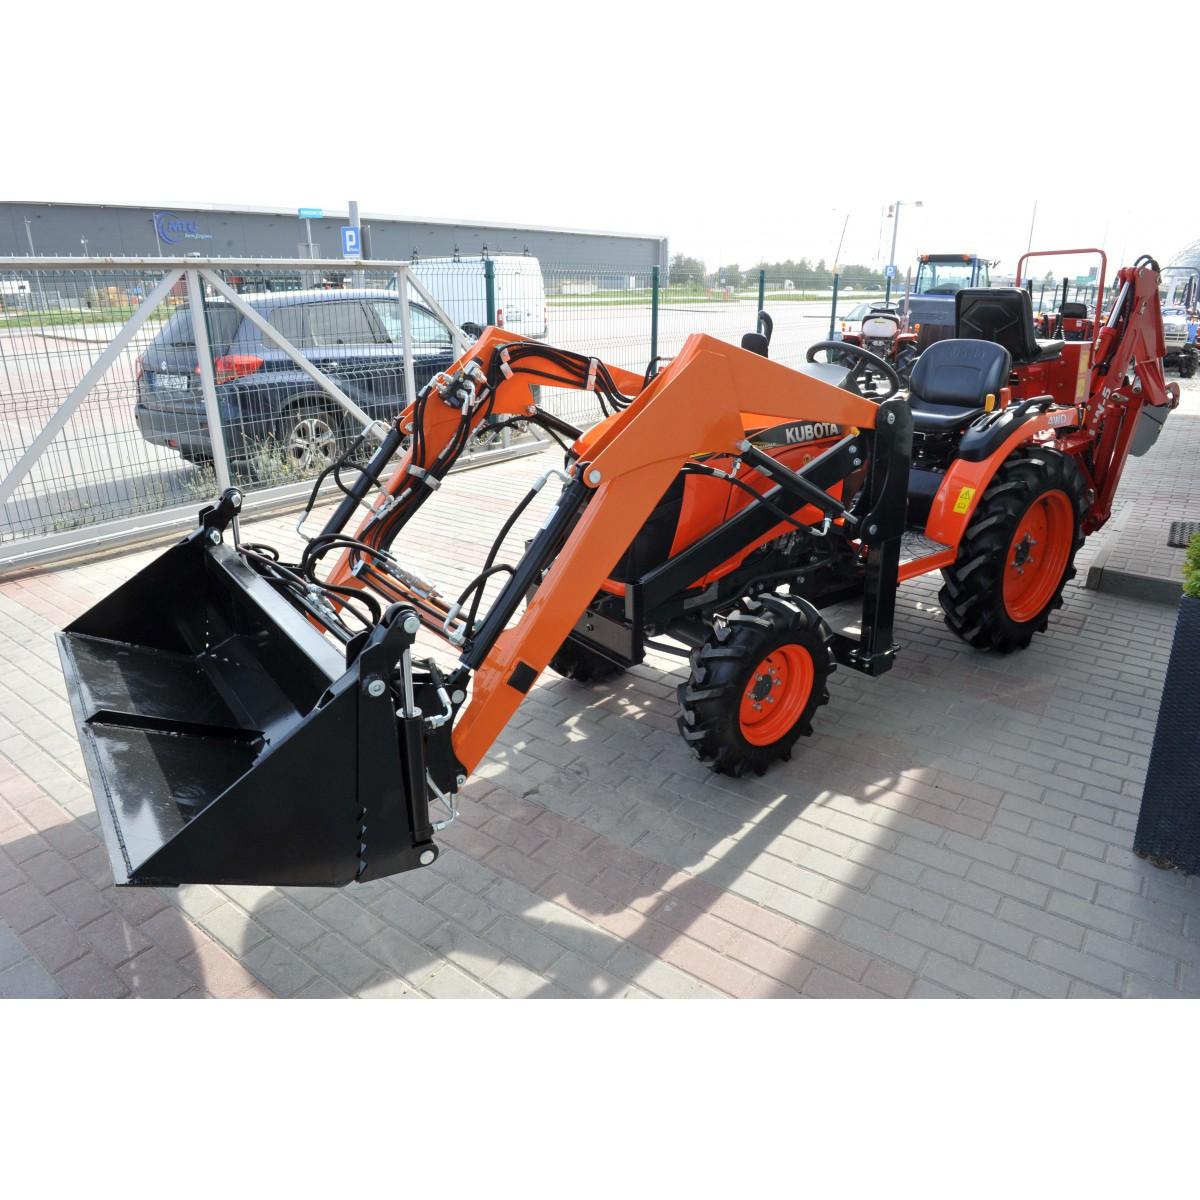 Kubota B2741 4x4 27HP + loader + LW-5 excavator